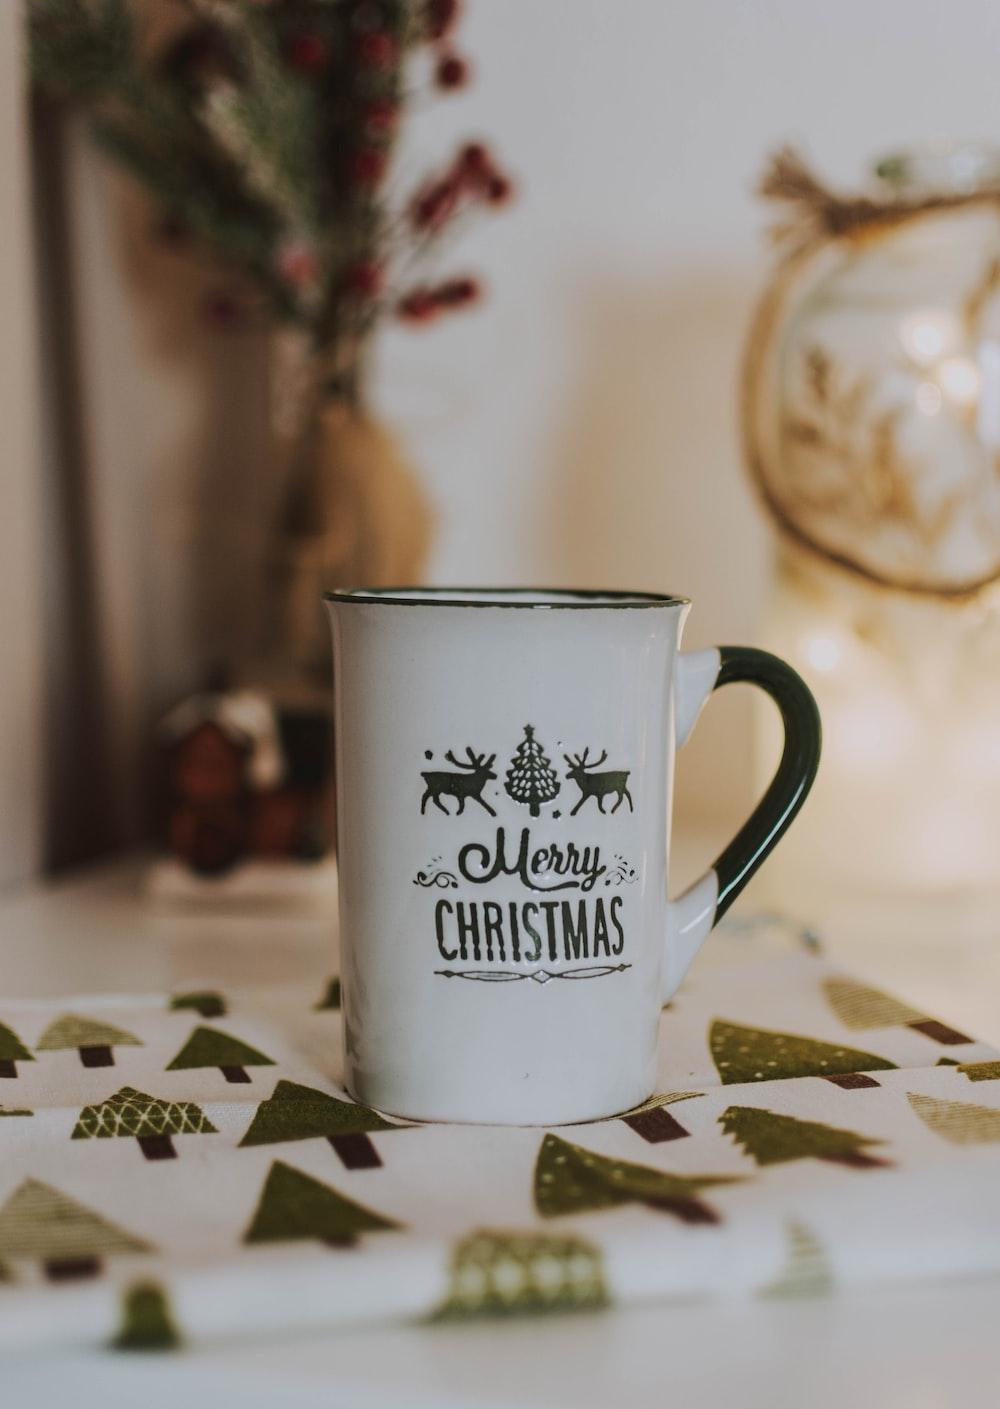 white and black Merry Christmas-painted mug